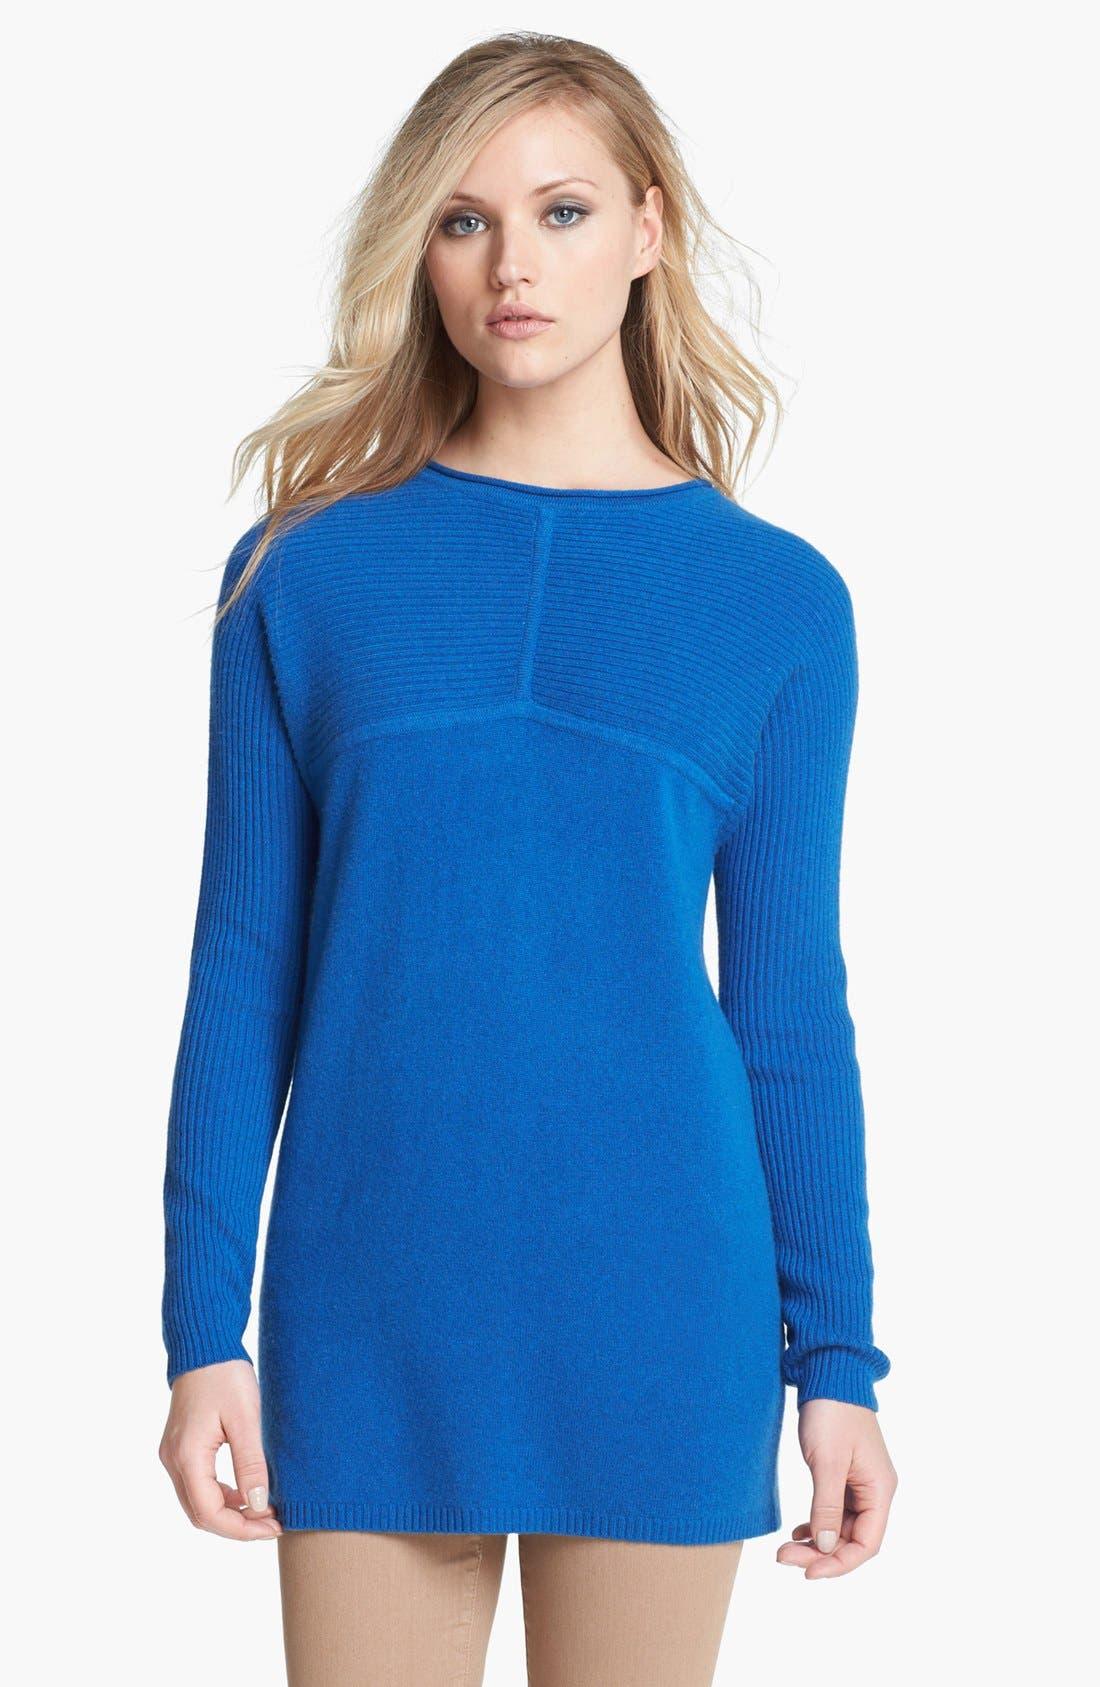 Main Image - Tory Burch 'Deanna' Cashmere Sweater